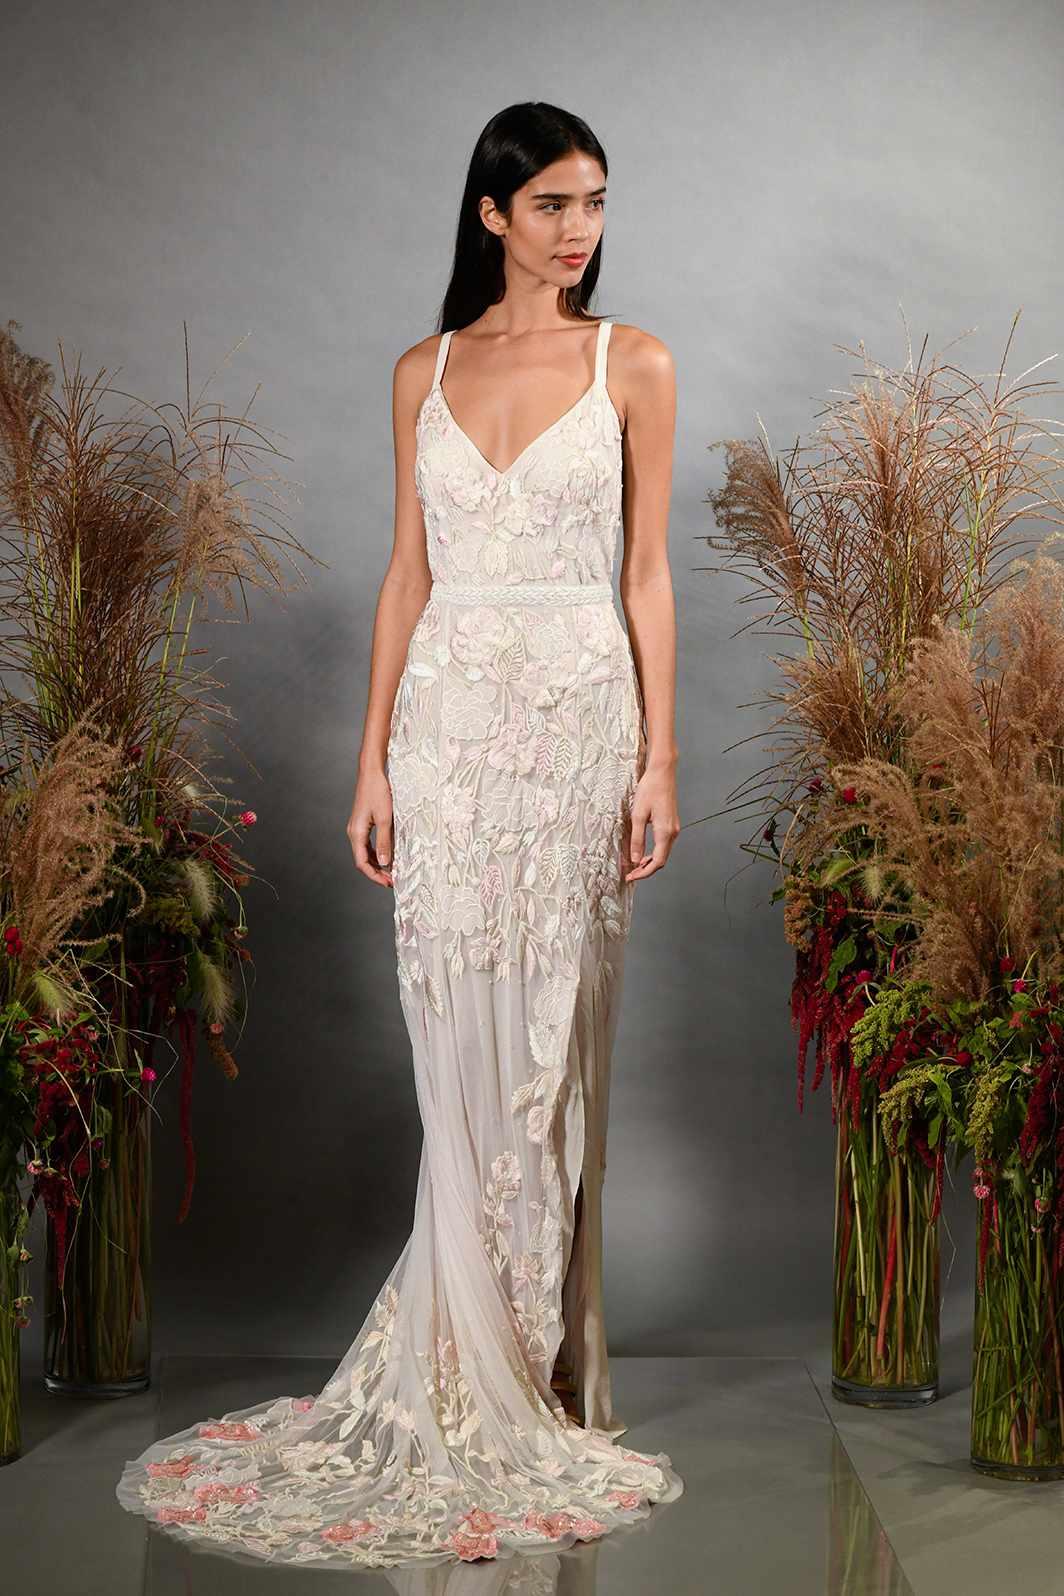 Model in plunging neckline sleeveless wedding dress